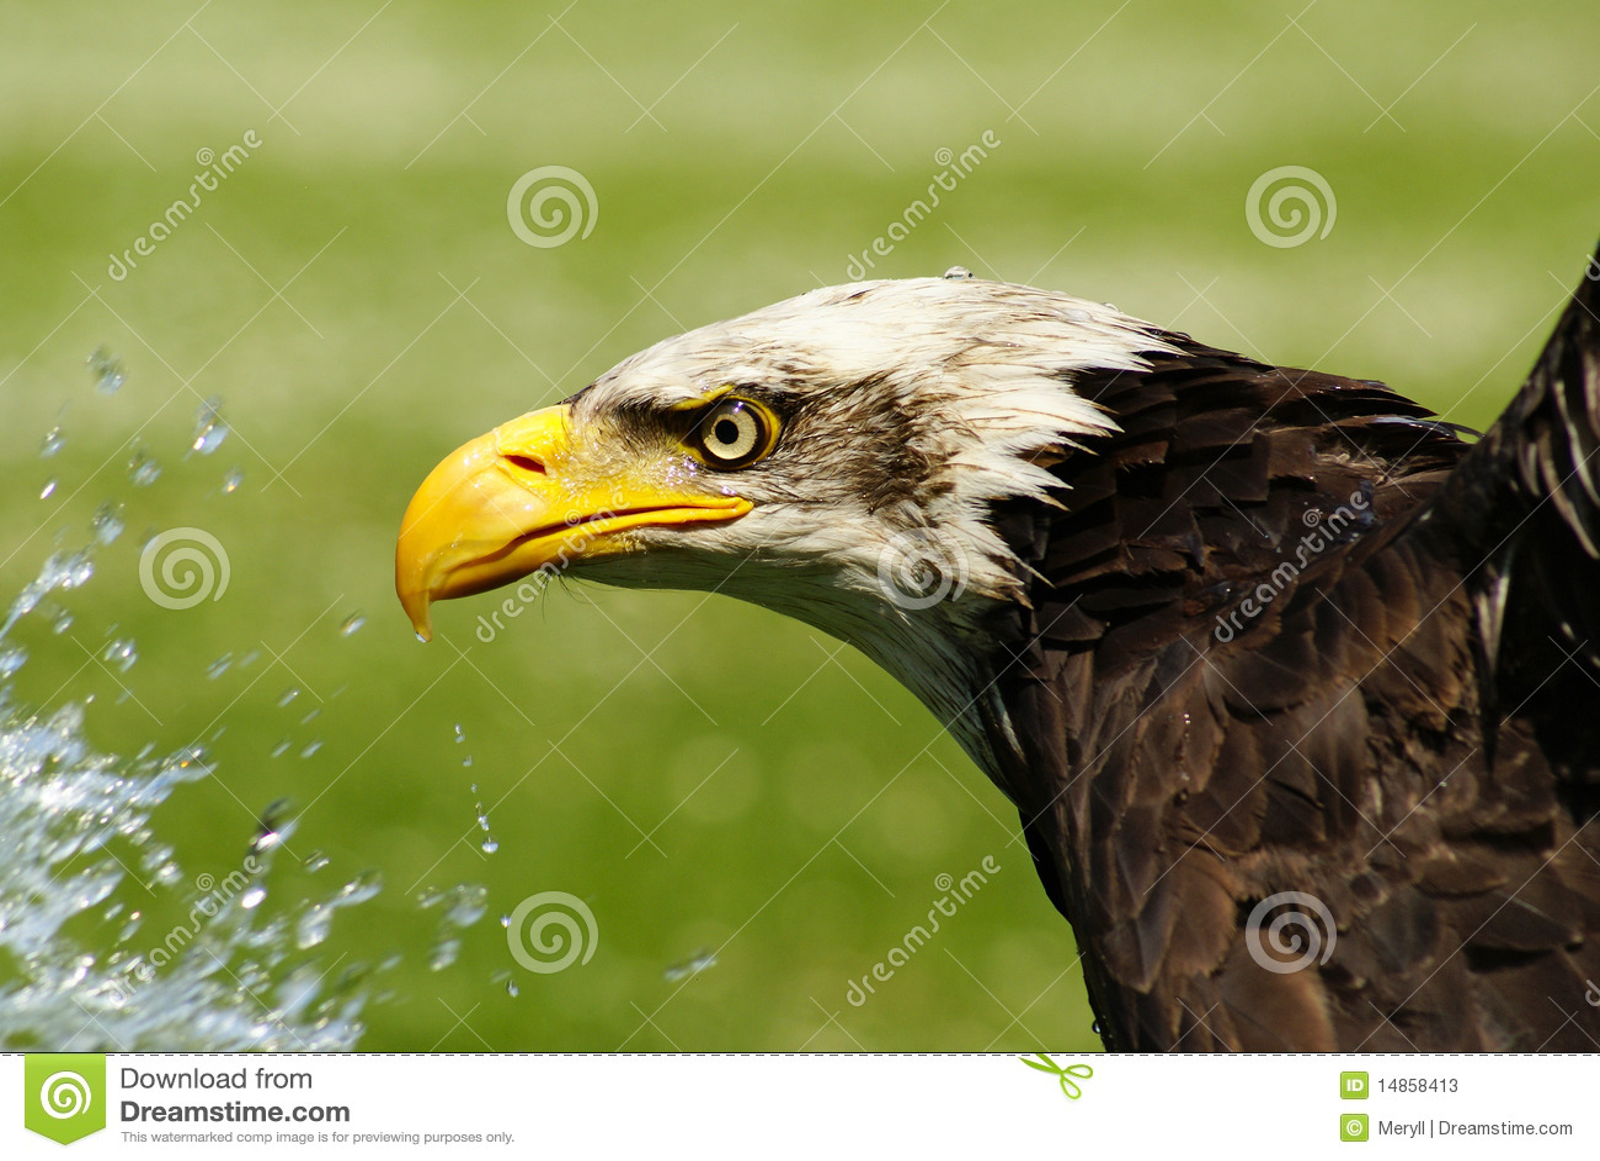 Bird of prey, refreshment